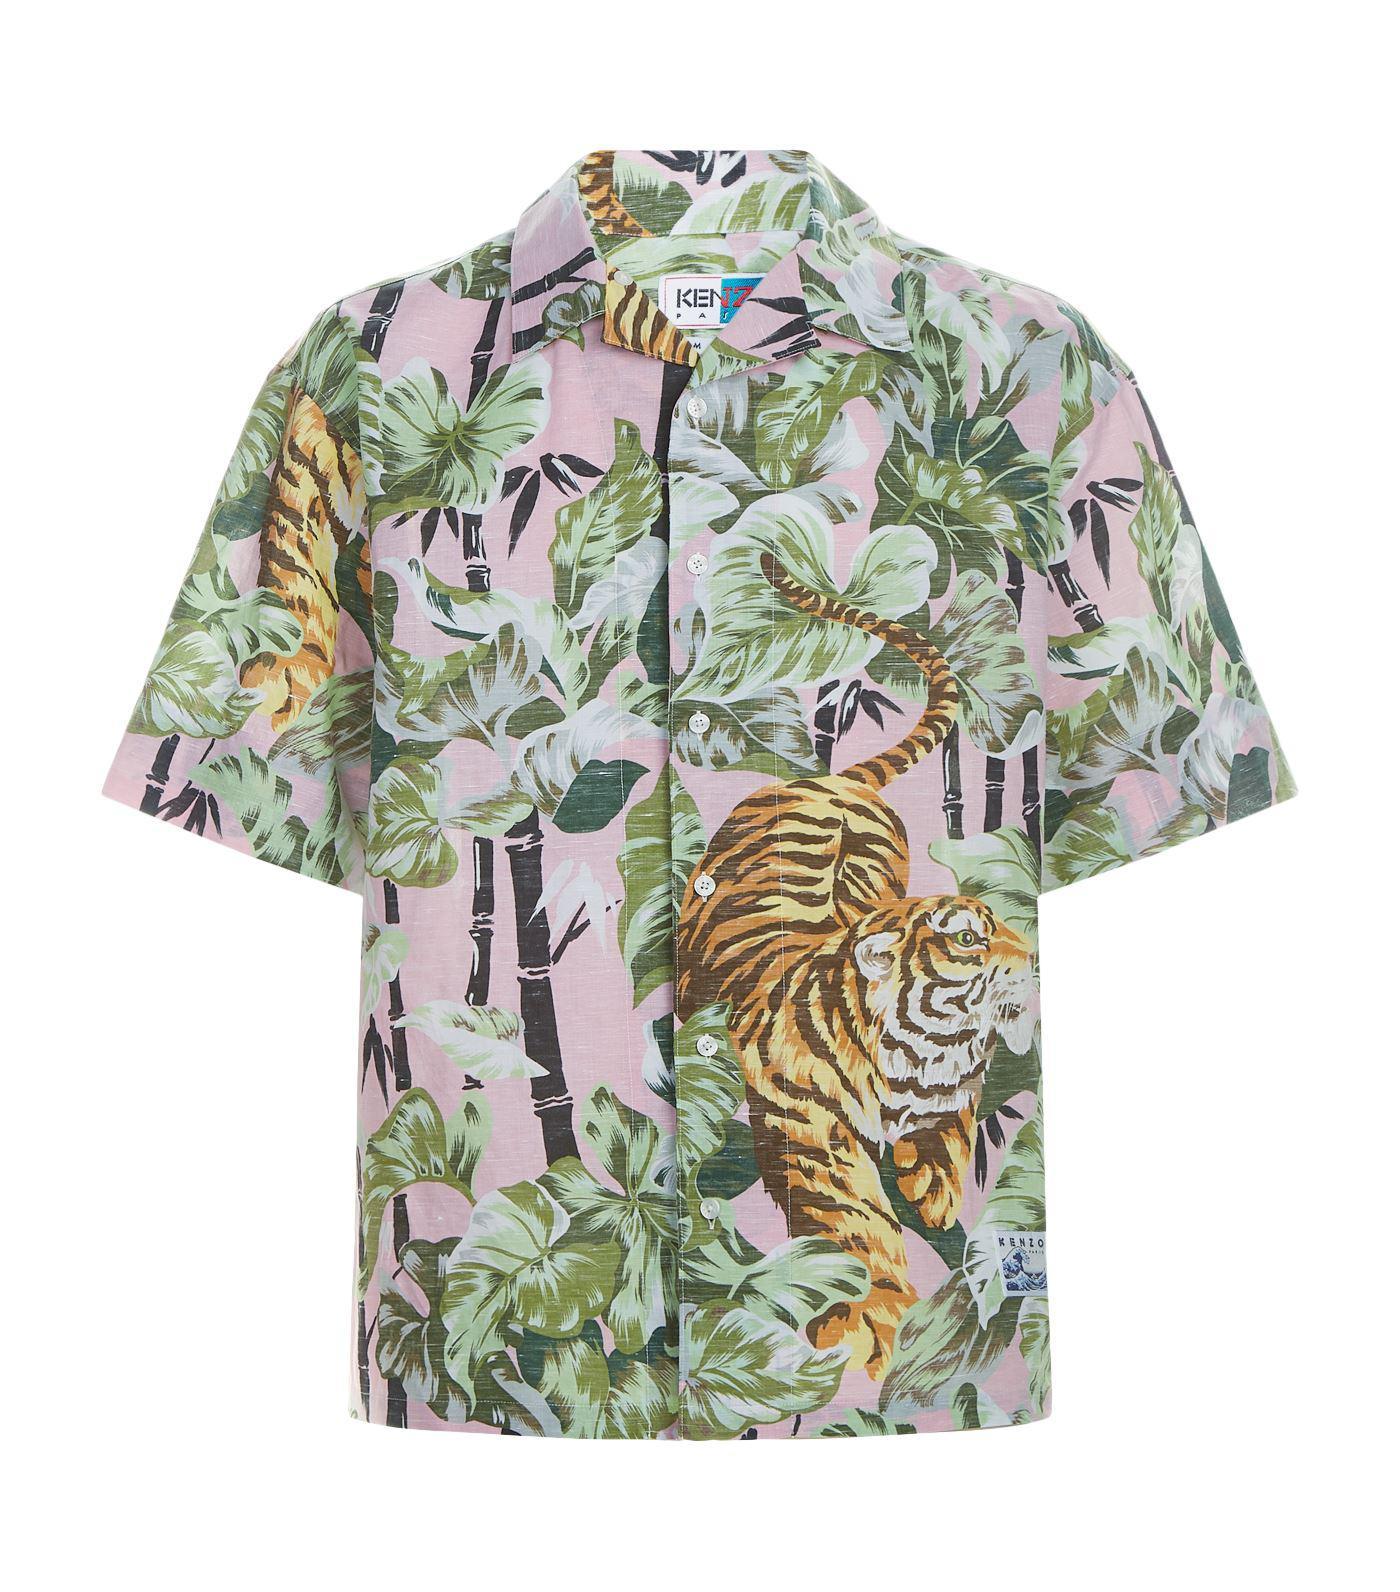 70c7fbce KENZO Bamboo Tiger Hawaiian Shirt in Pink for Men - Lyst